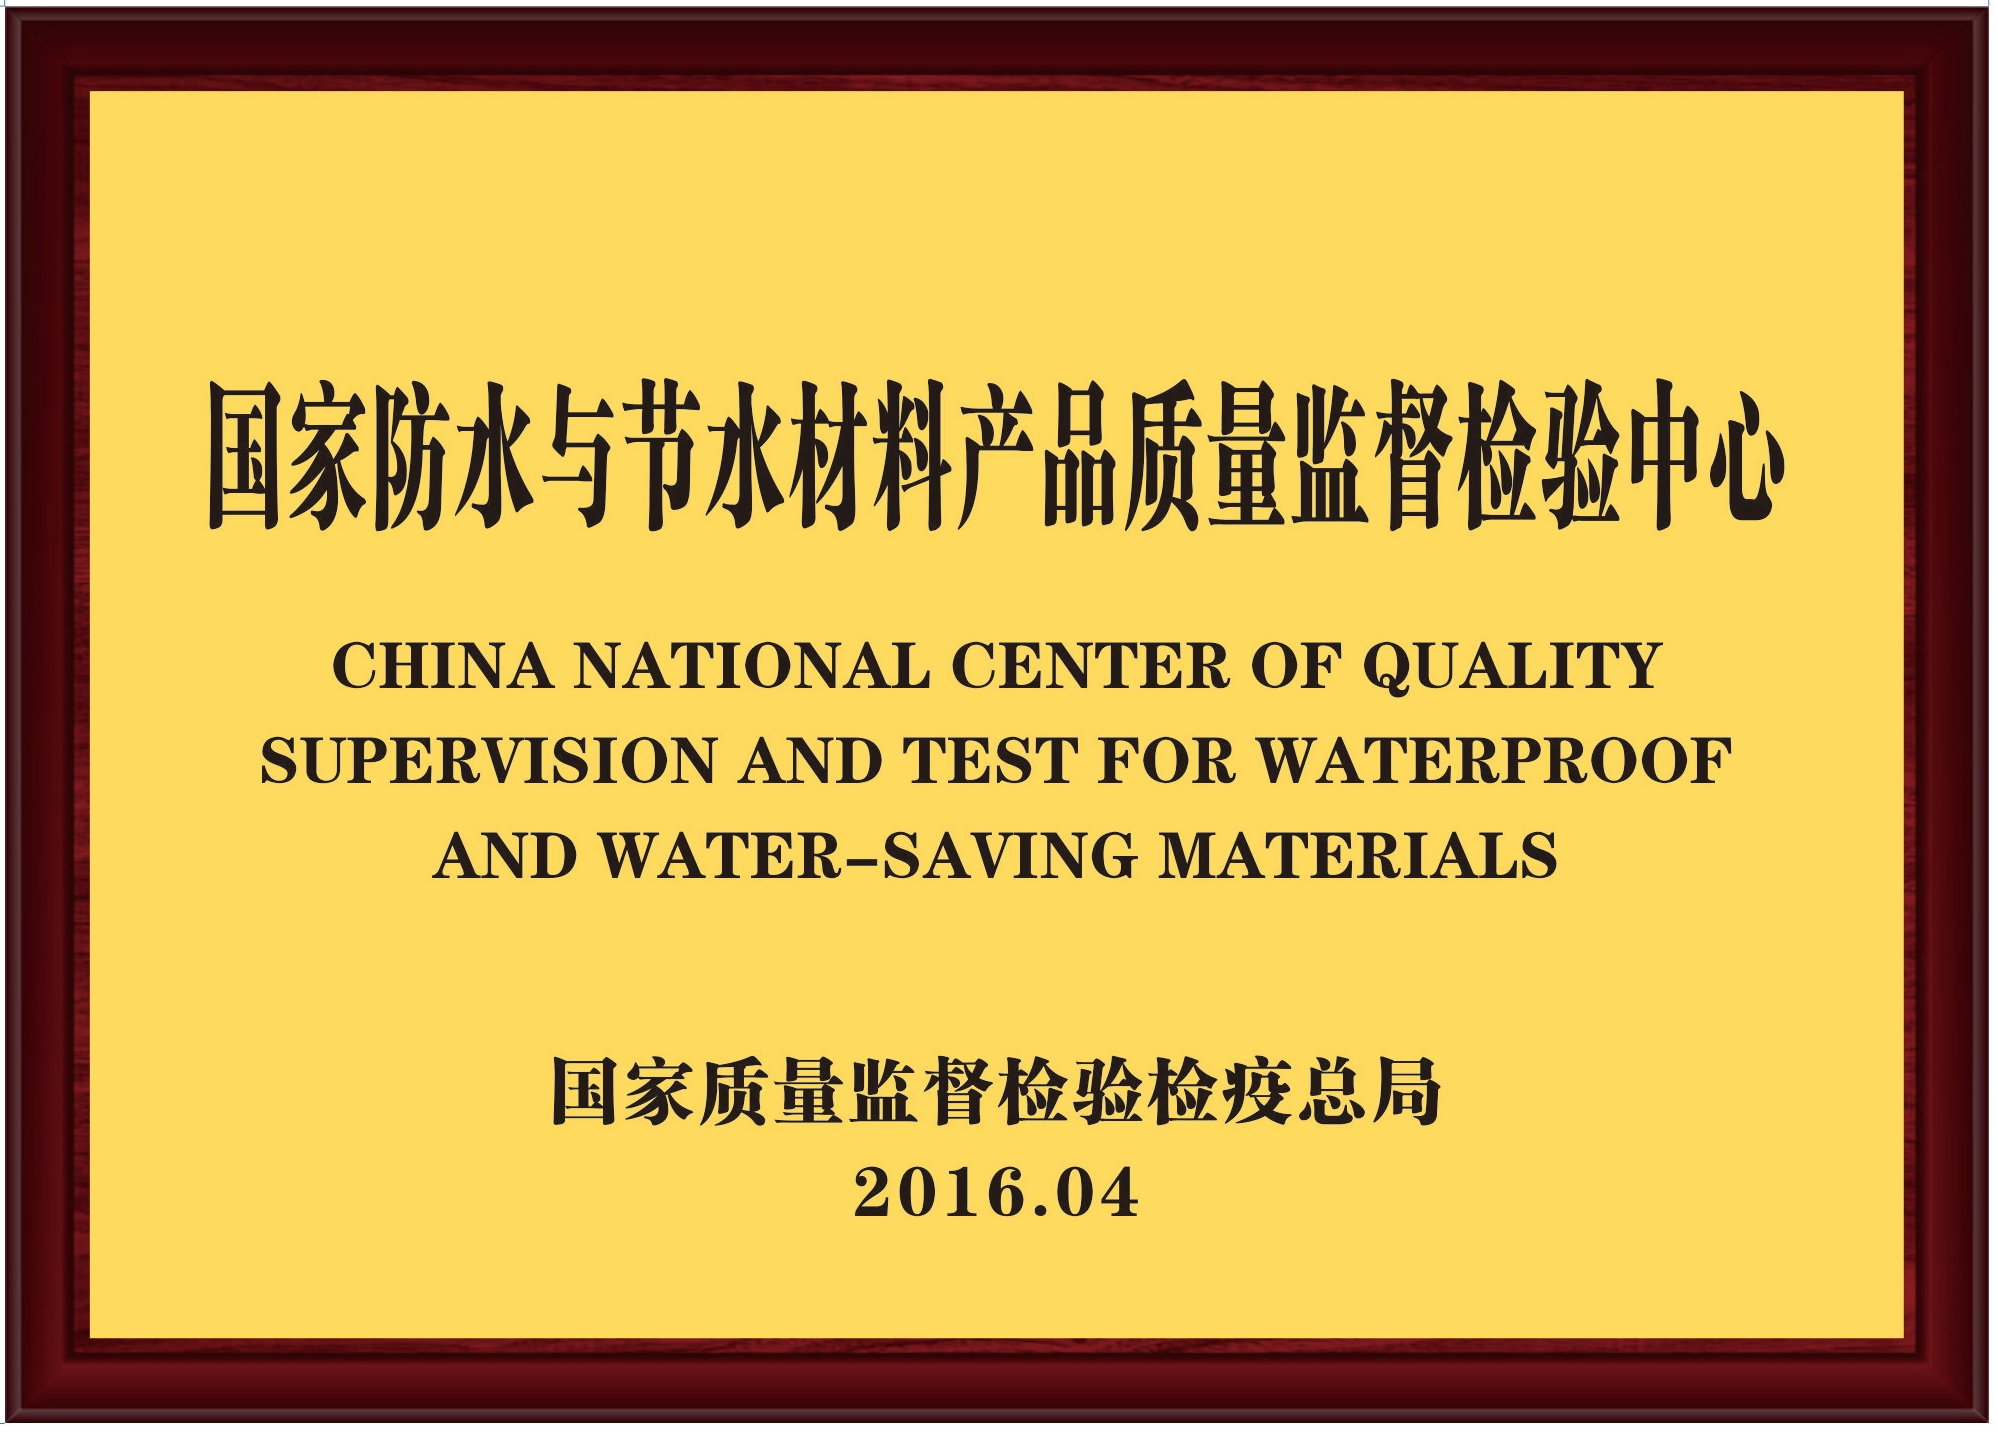 国jia防水与节水�shi�zhongxin